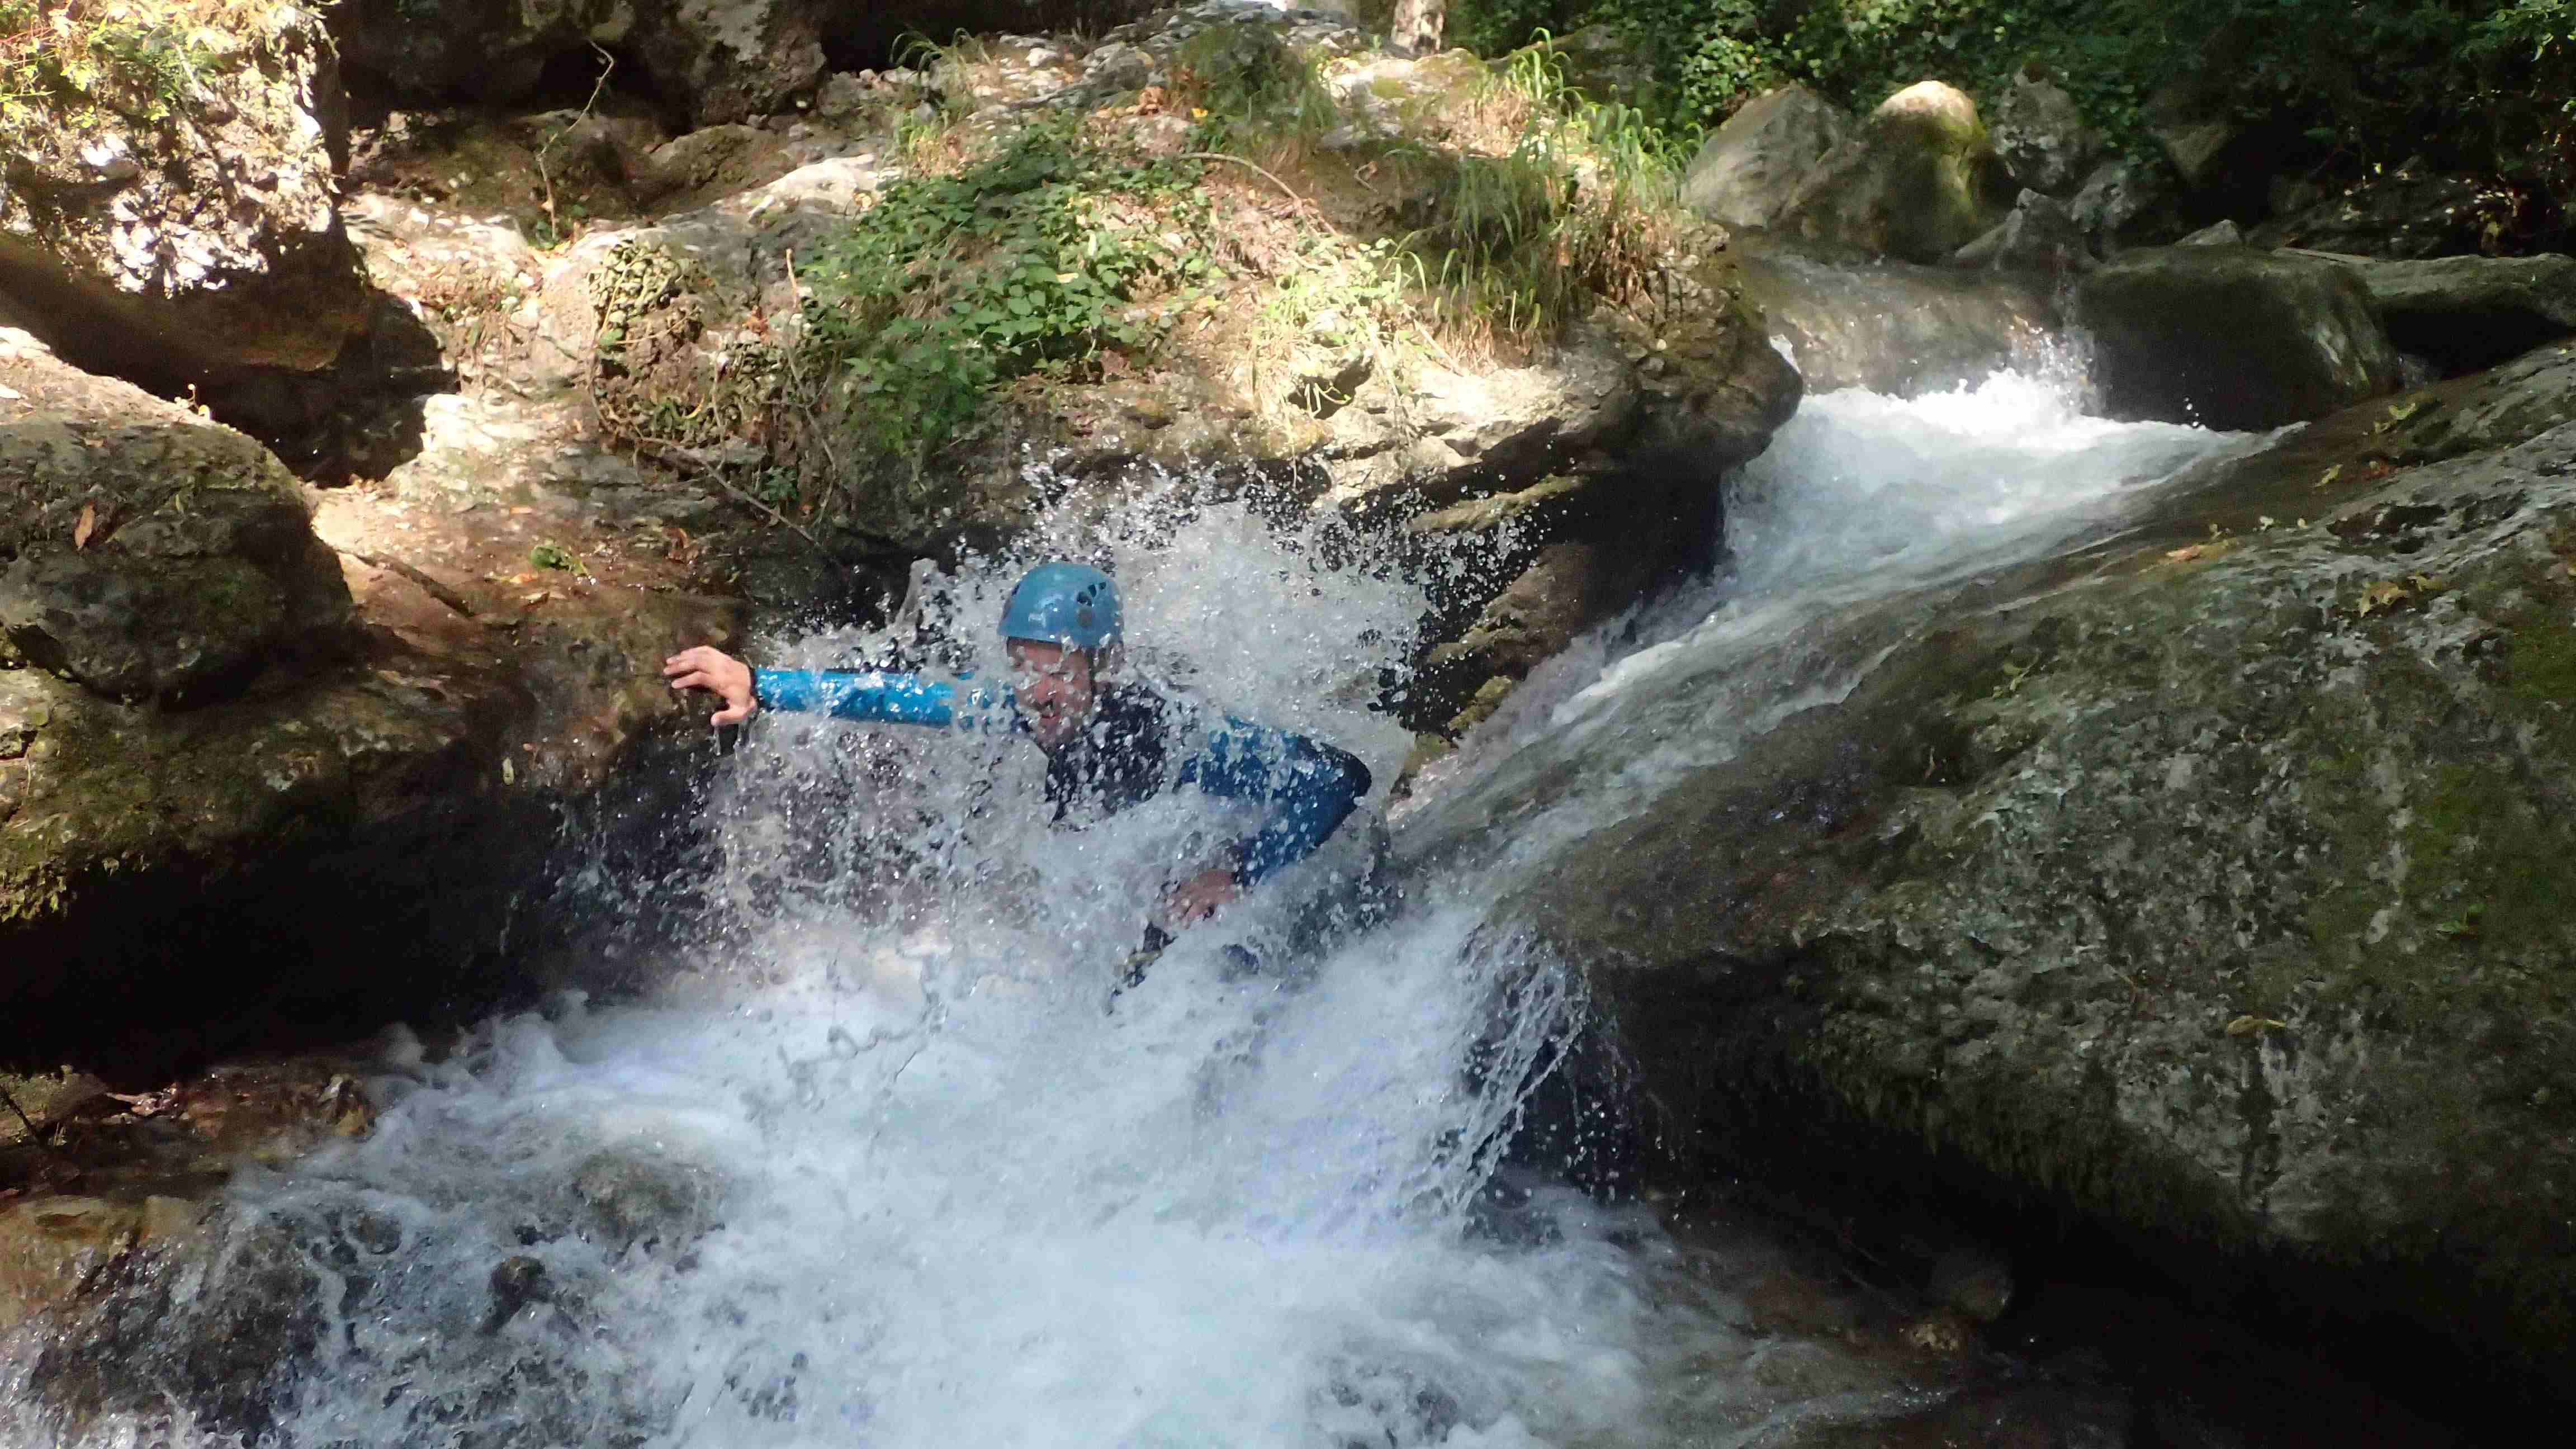 douche en canyoning Vercors